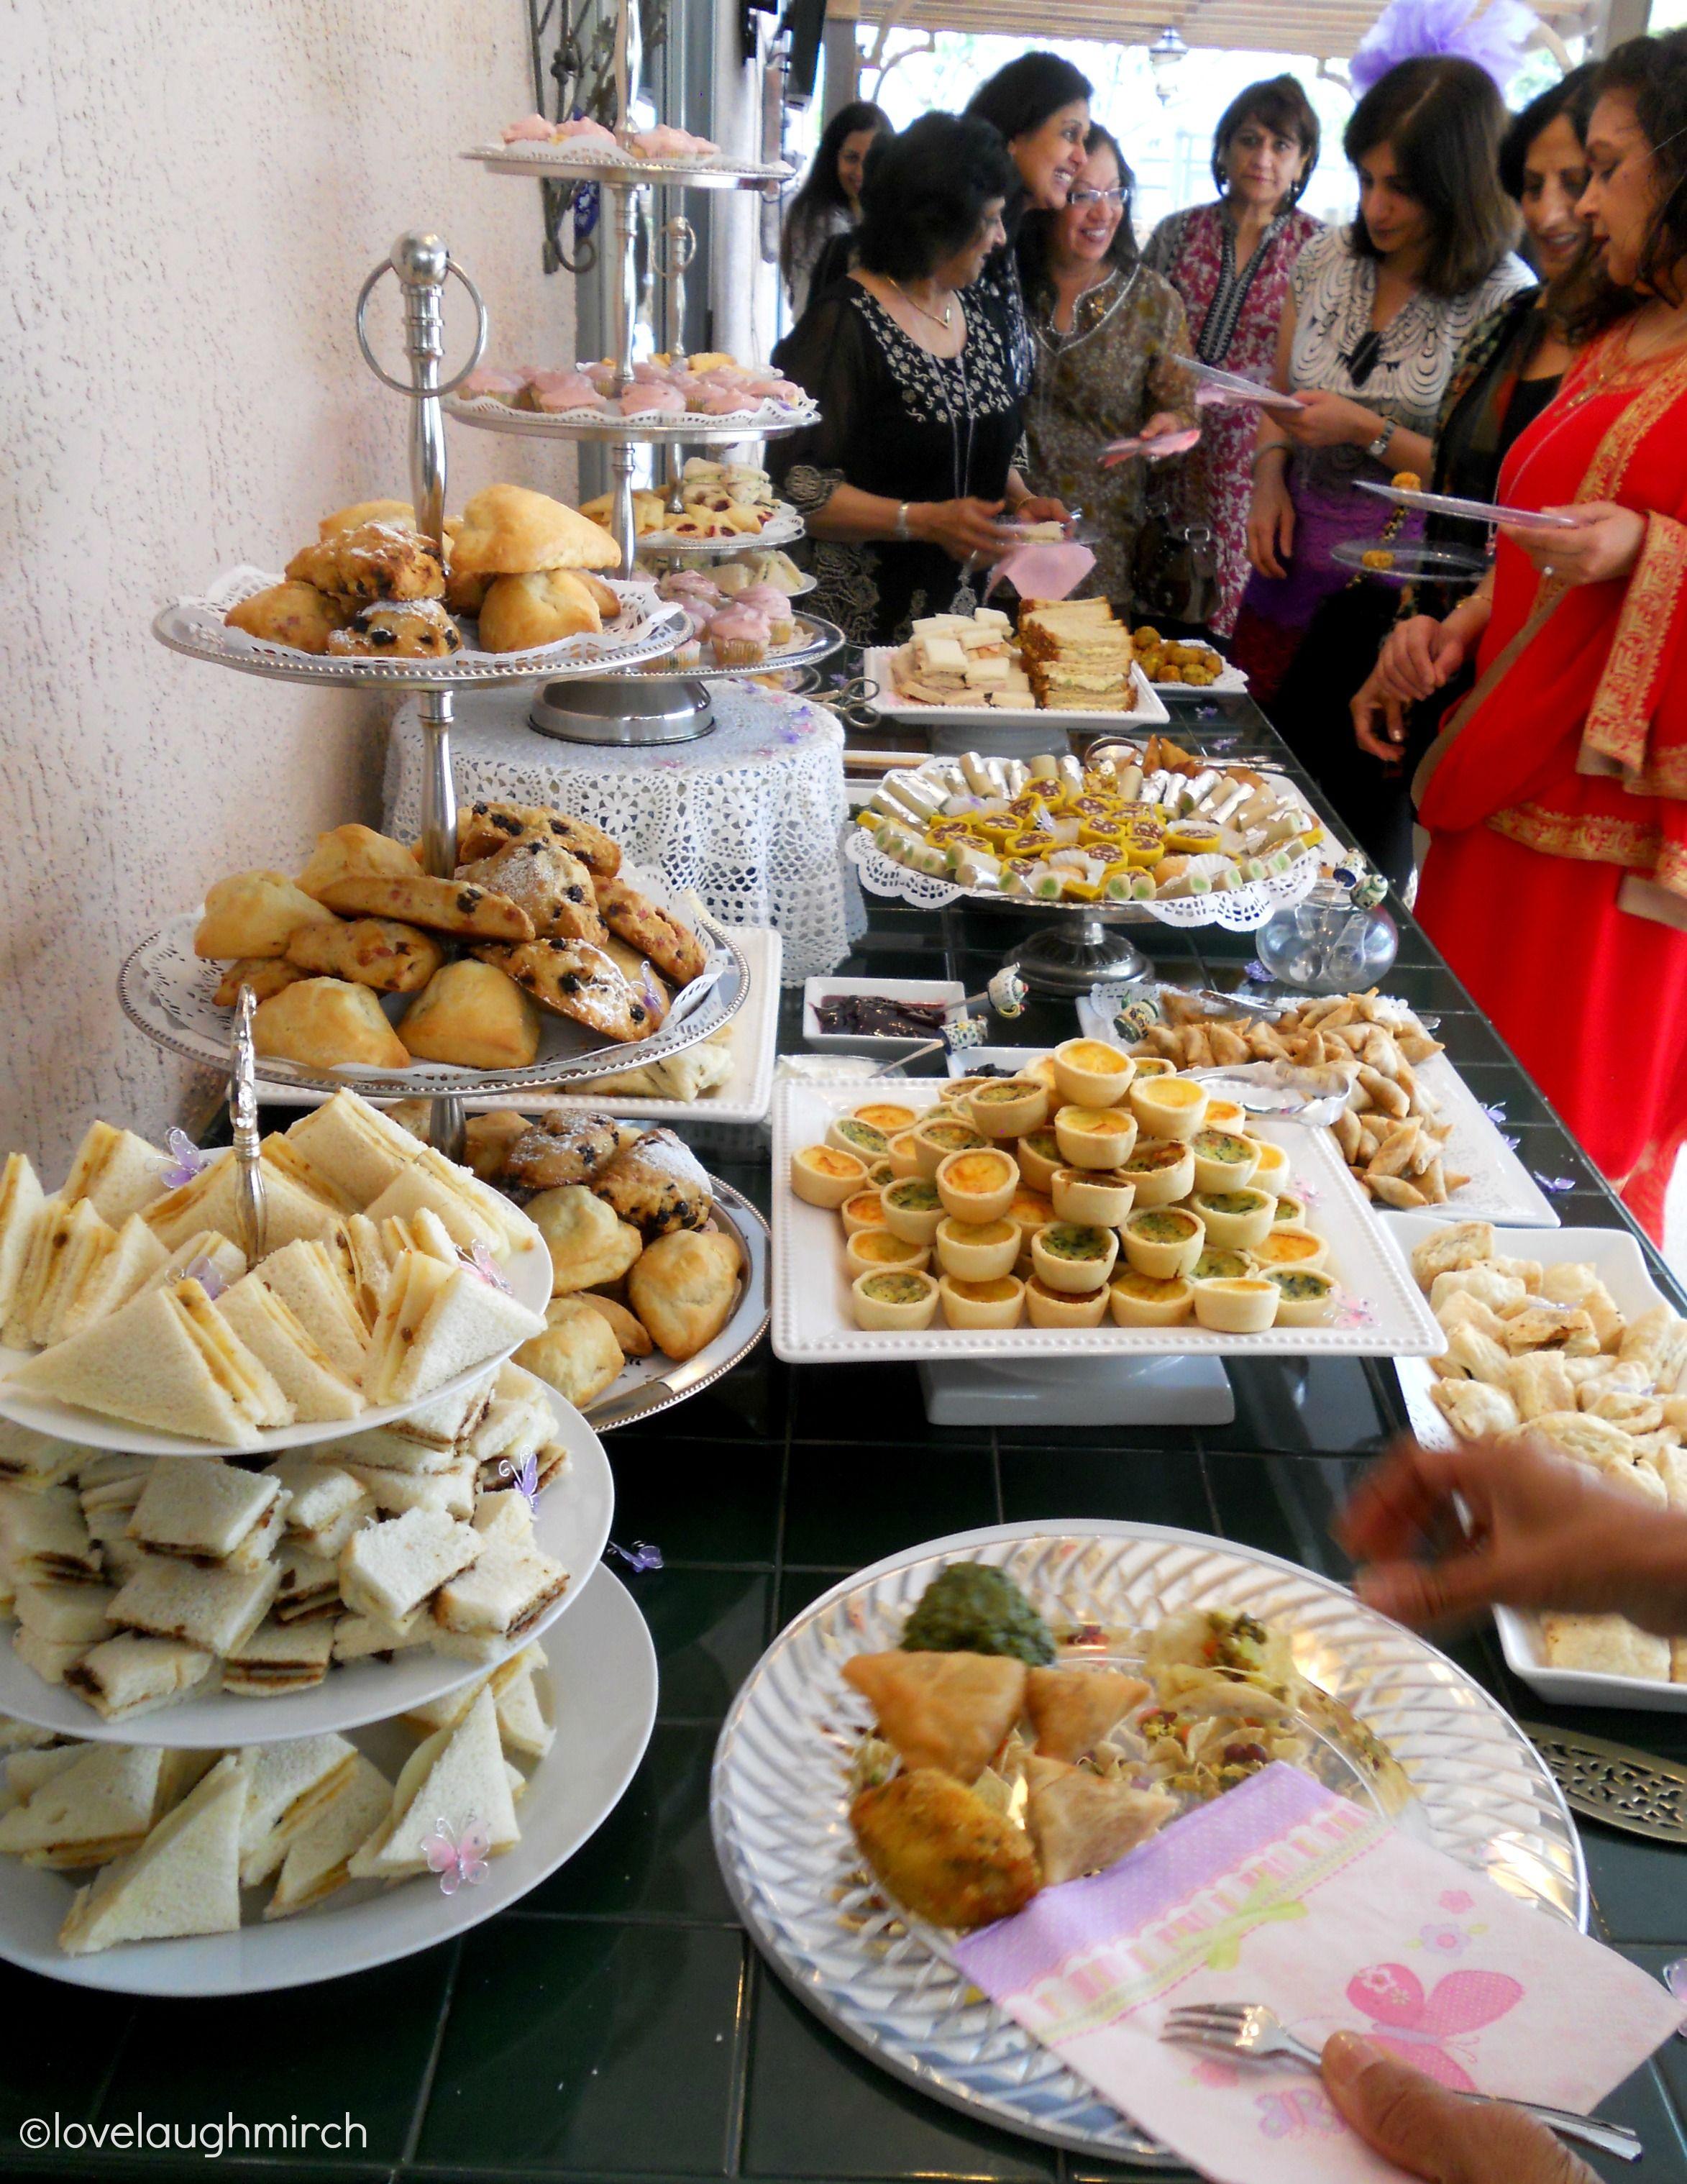 ideas for bridal shower brunch food%0A bacf d c   c    e  b ef    d eb  jpg          pixels   Amanda b party    Pinterest   Tea parties  Teas and Brunch